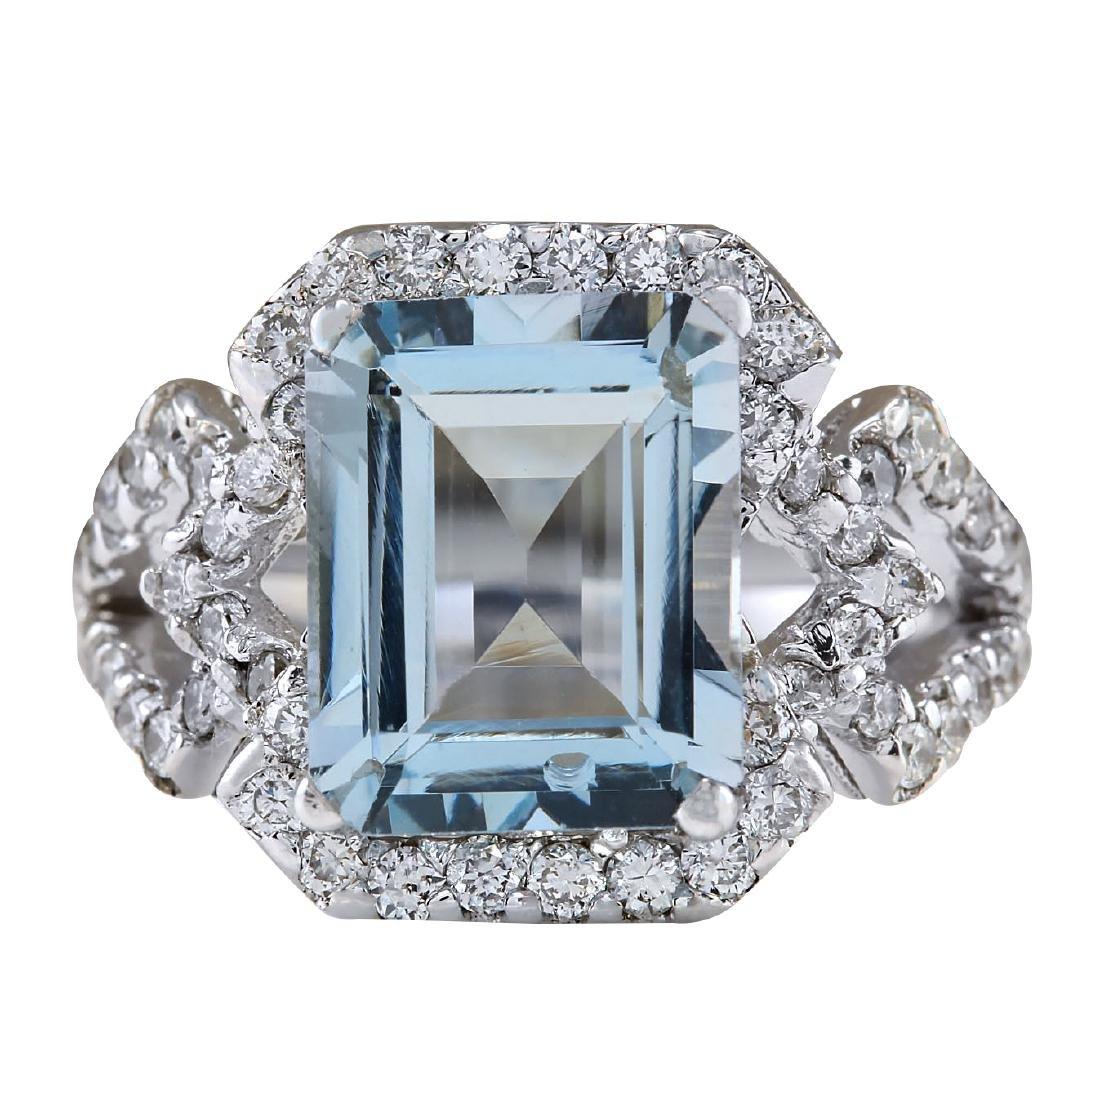 4.26CTW Natural Aquamarine And Diamond Ring In 18K